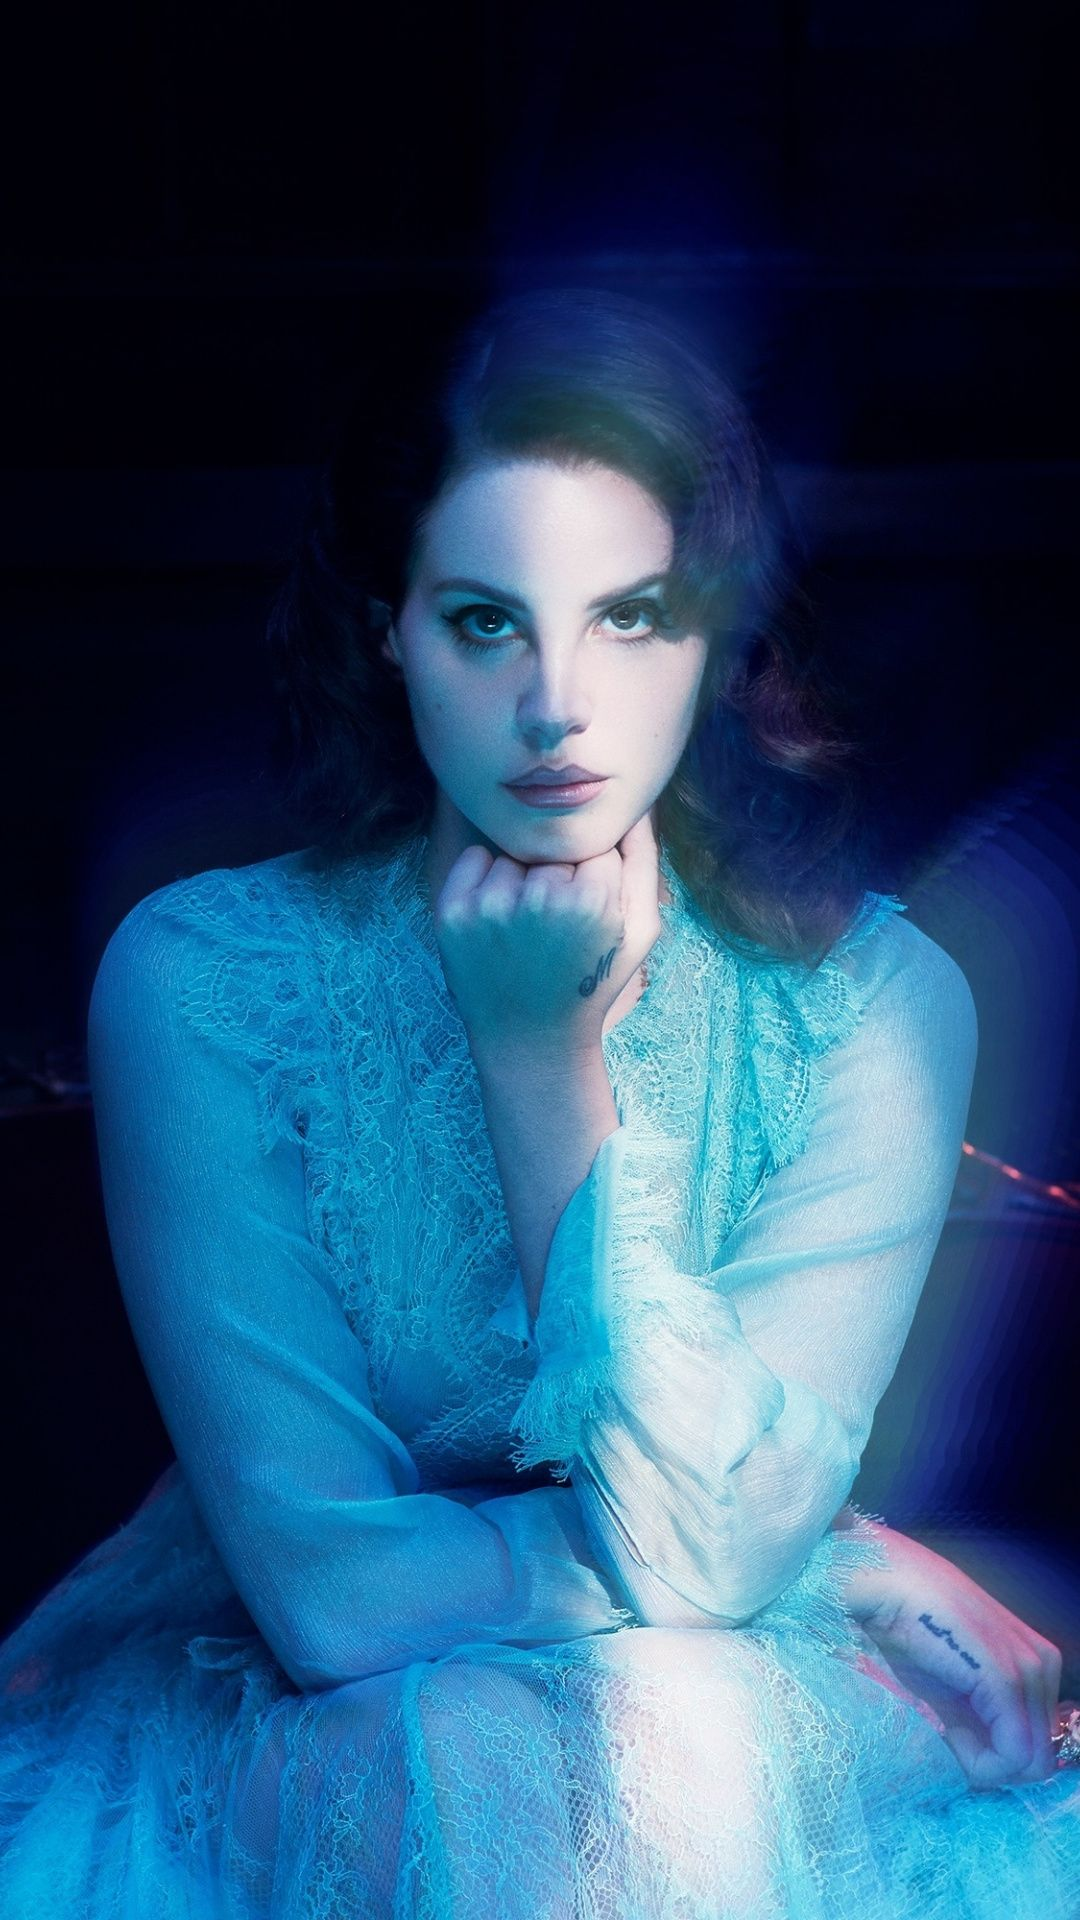 Celebrity Photoshooot Lana Del Rey Complex 1080x1920 Wallpaper Lana Del Rey Lana Del Lana